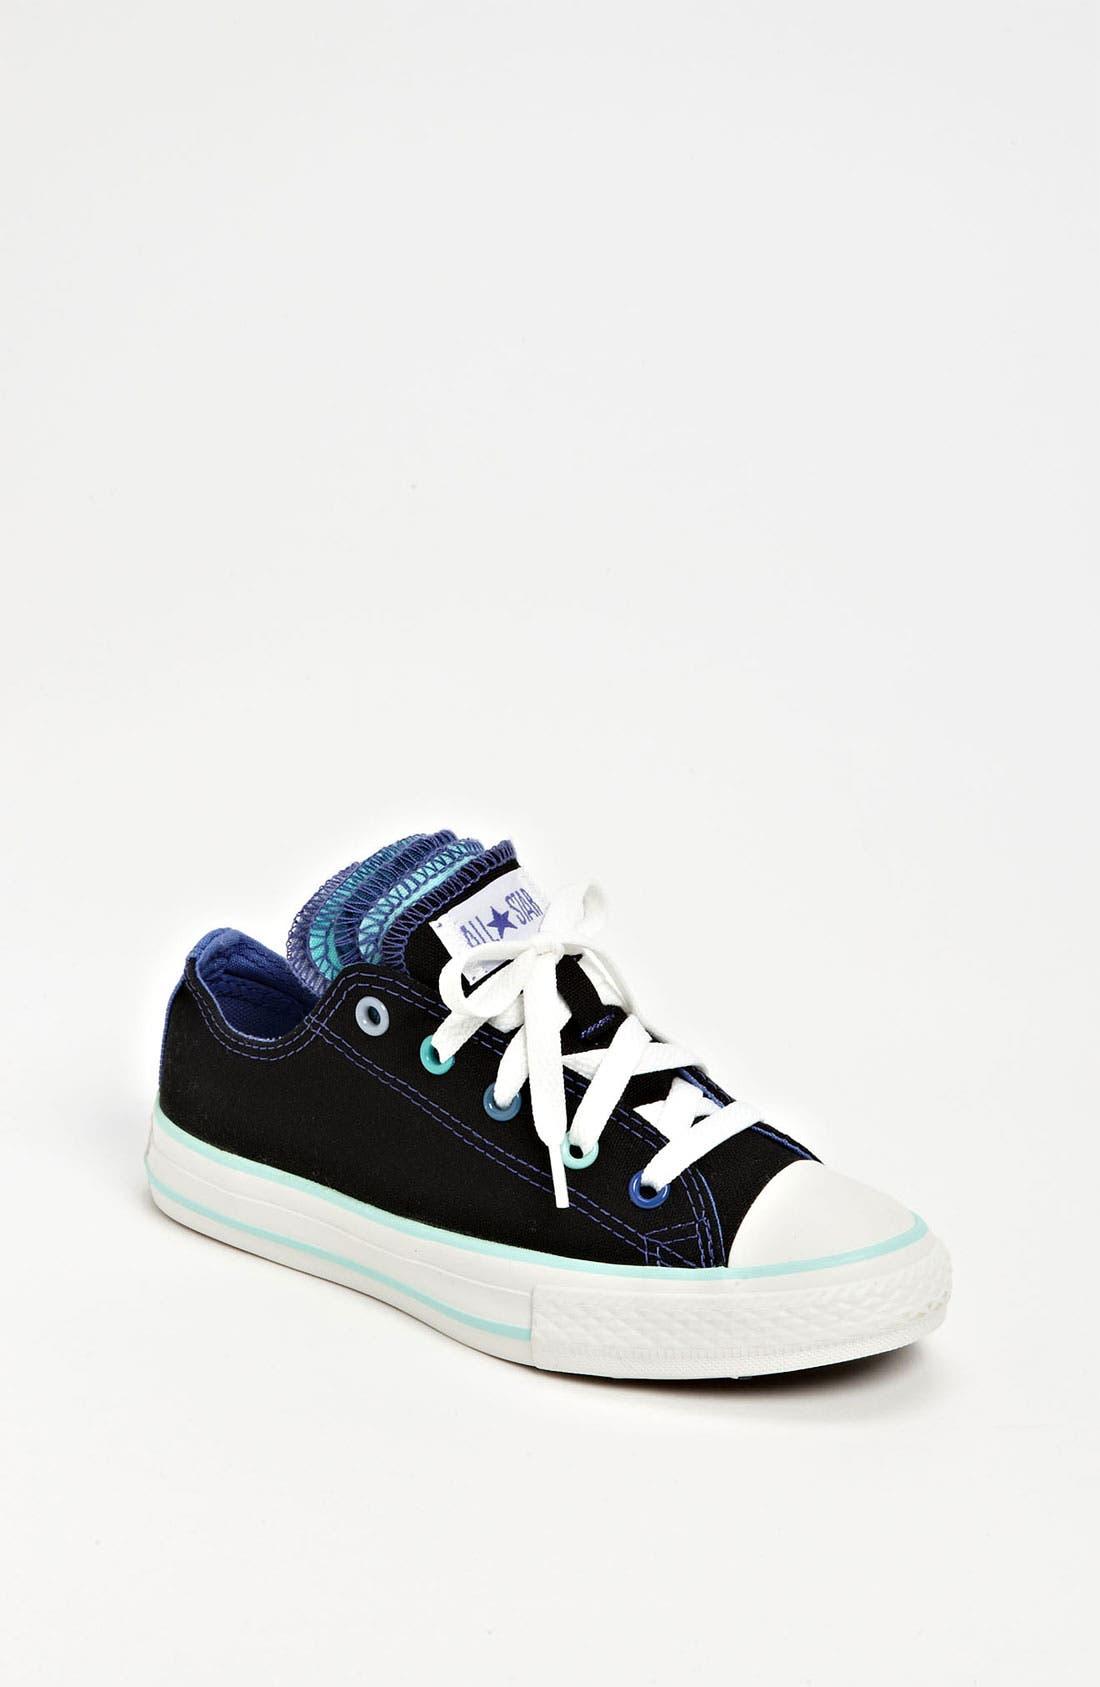 Main Image - Converse Chuck Taylor® All Star® Multi Tongue Sneaker (Toddler, Little Kid & Big Kid)